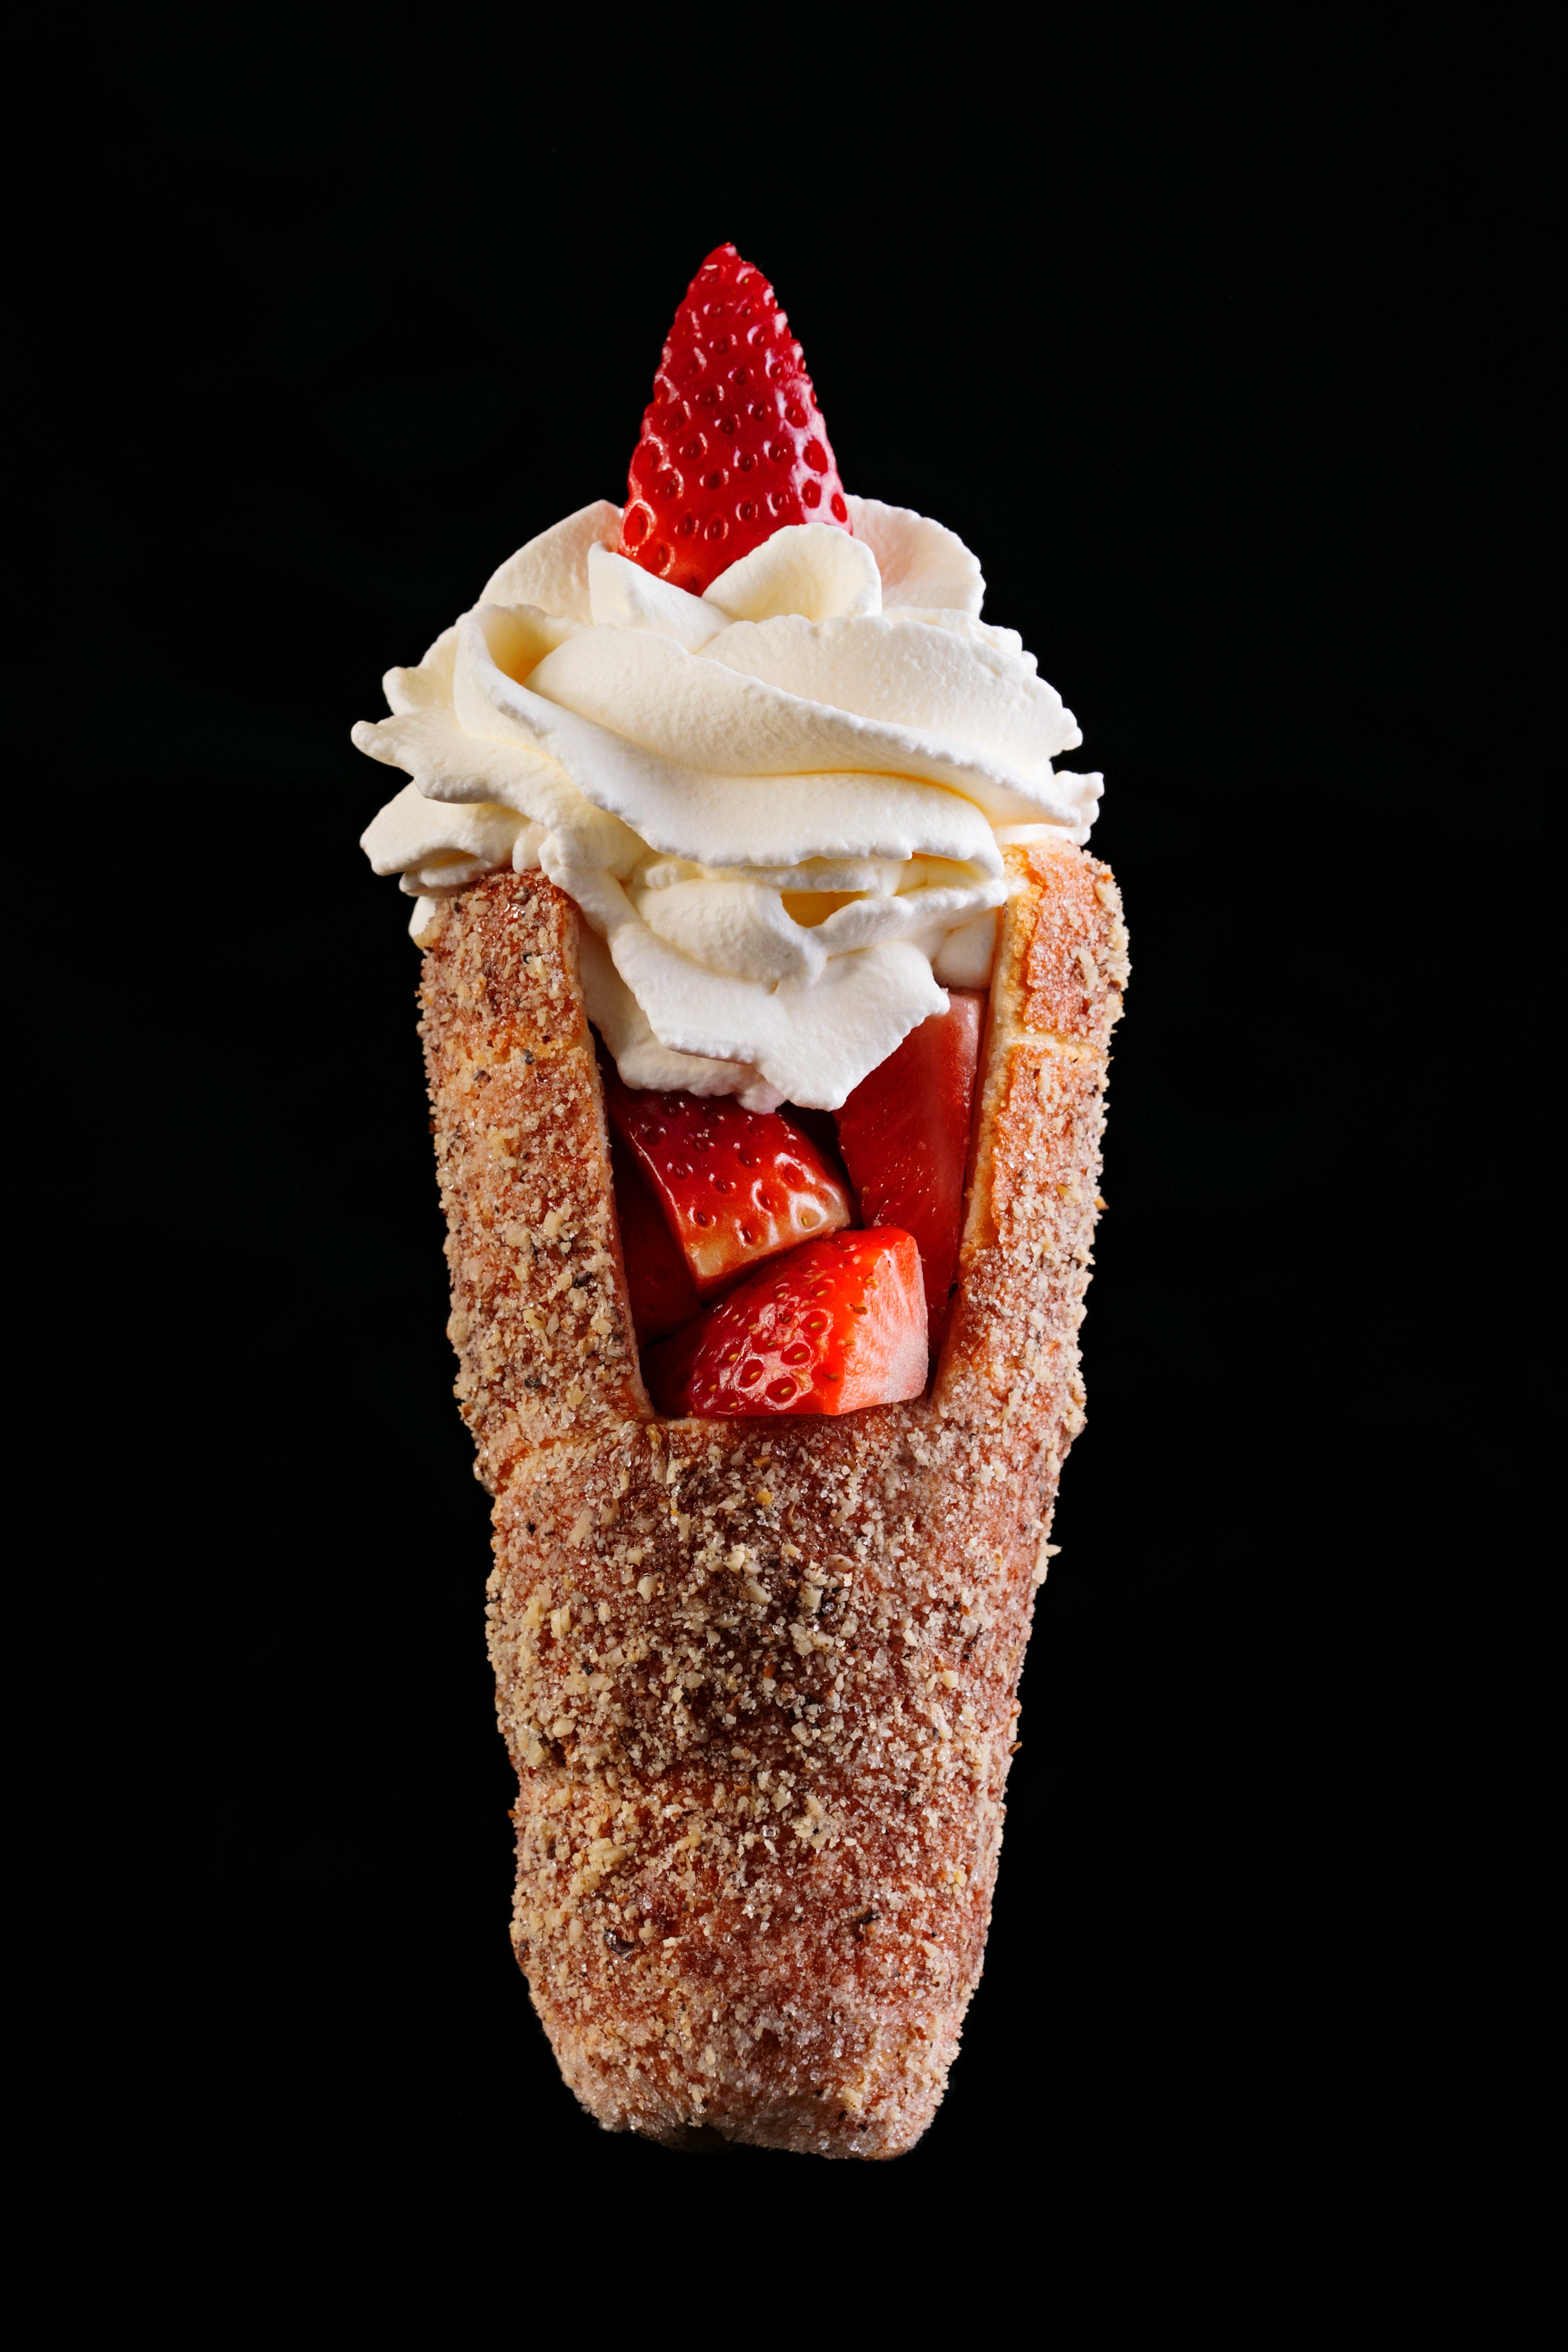 Homemade Mint Ice Cream Cake